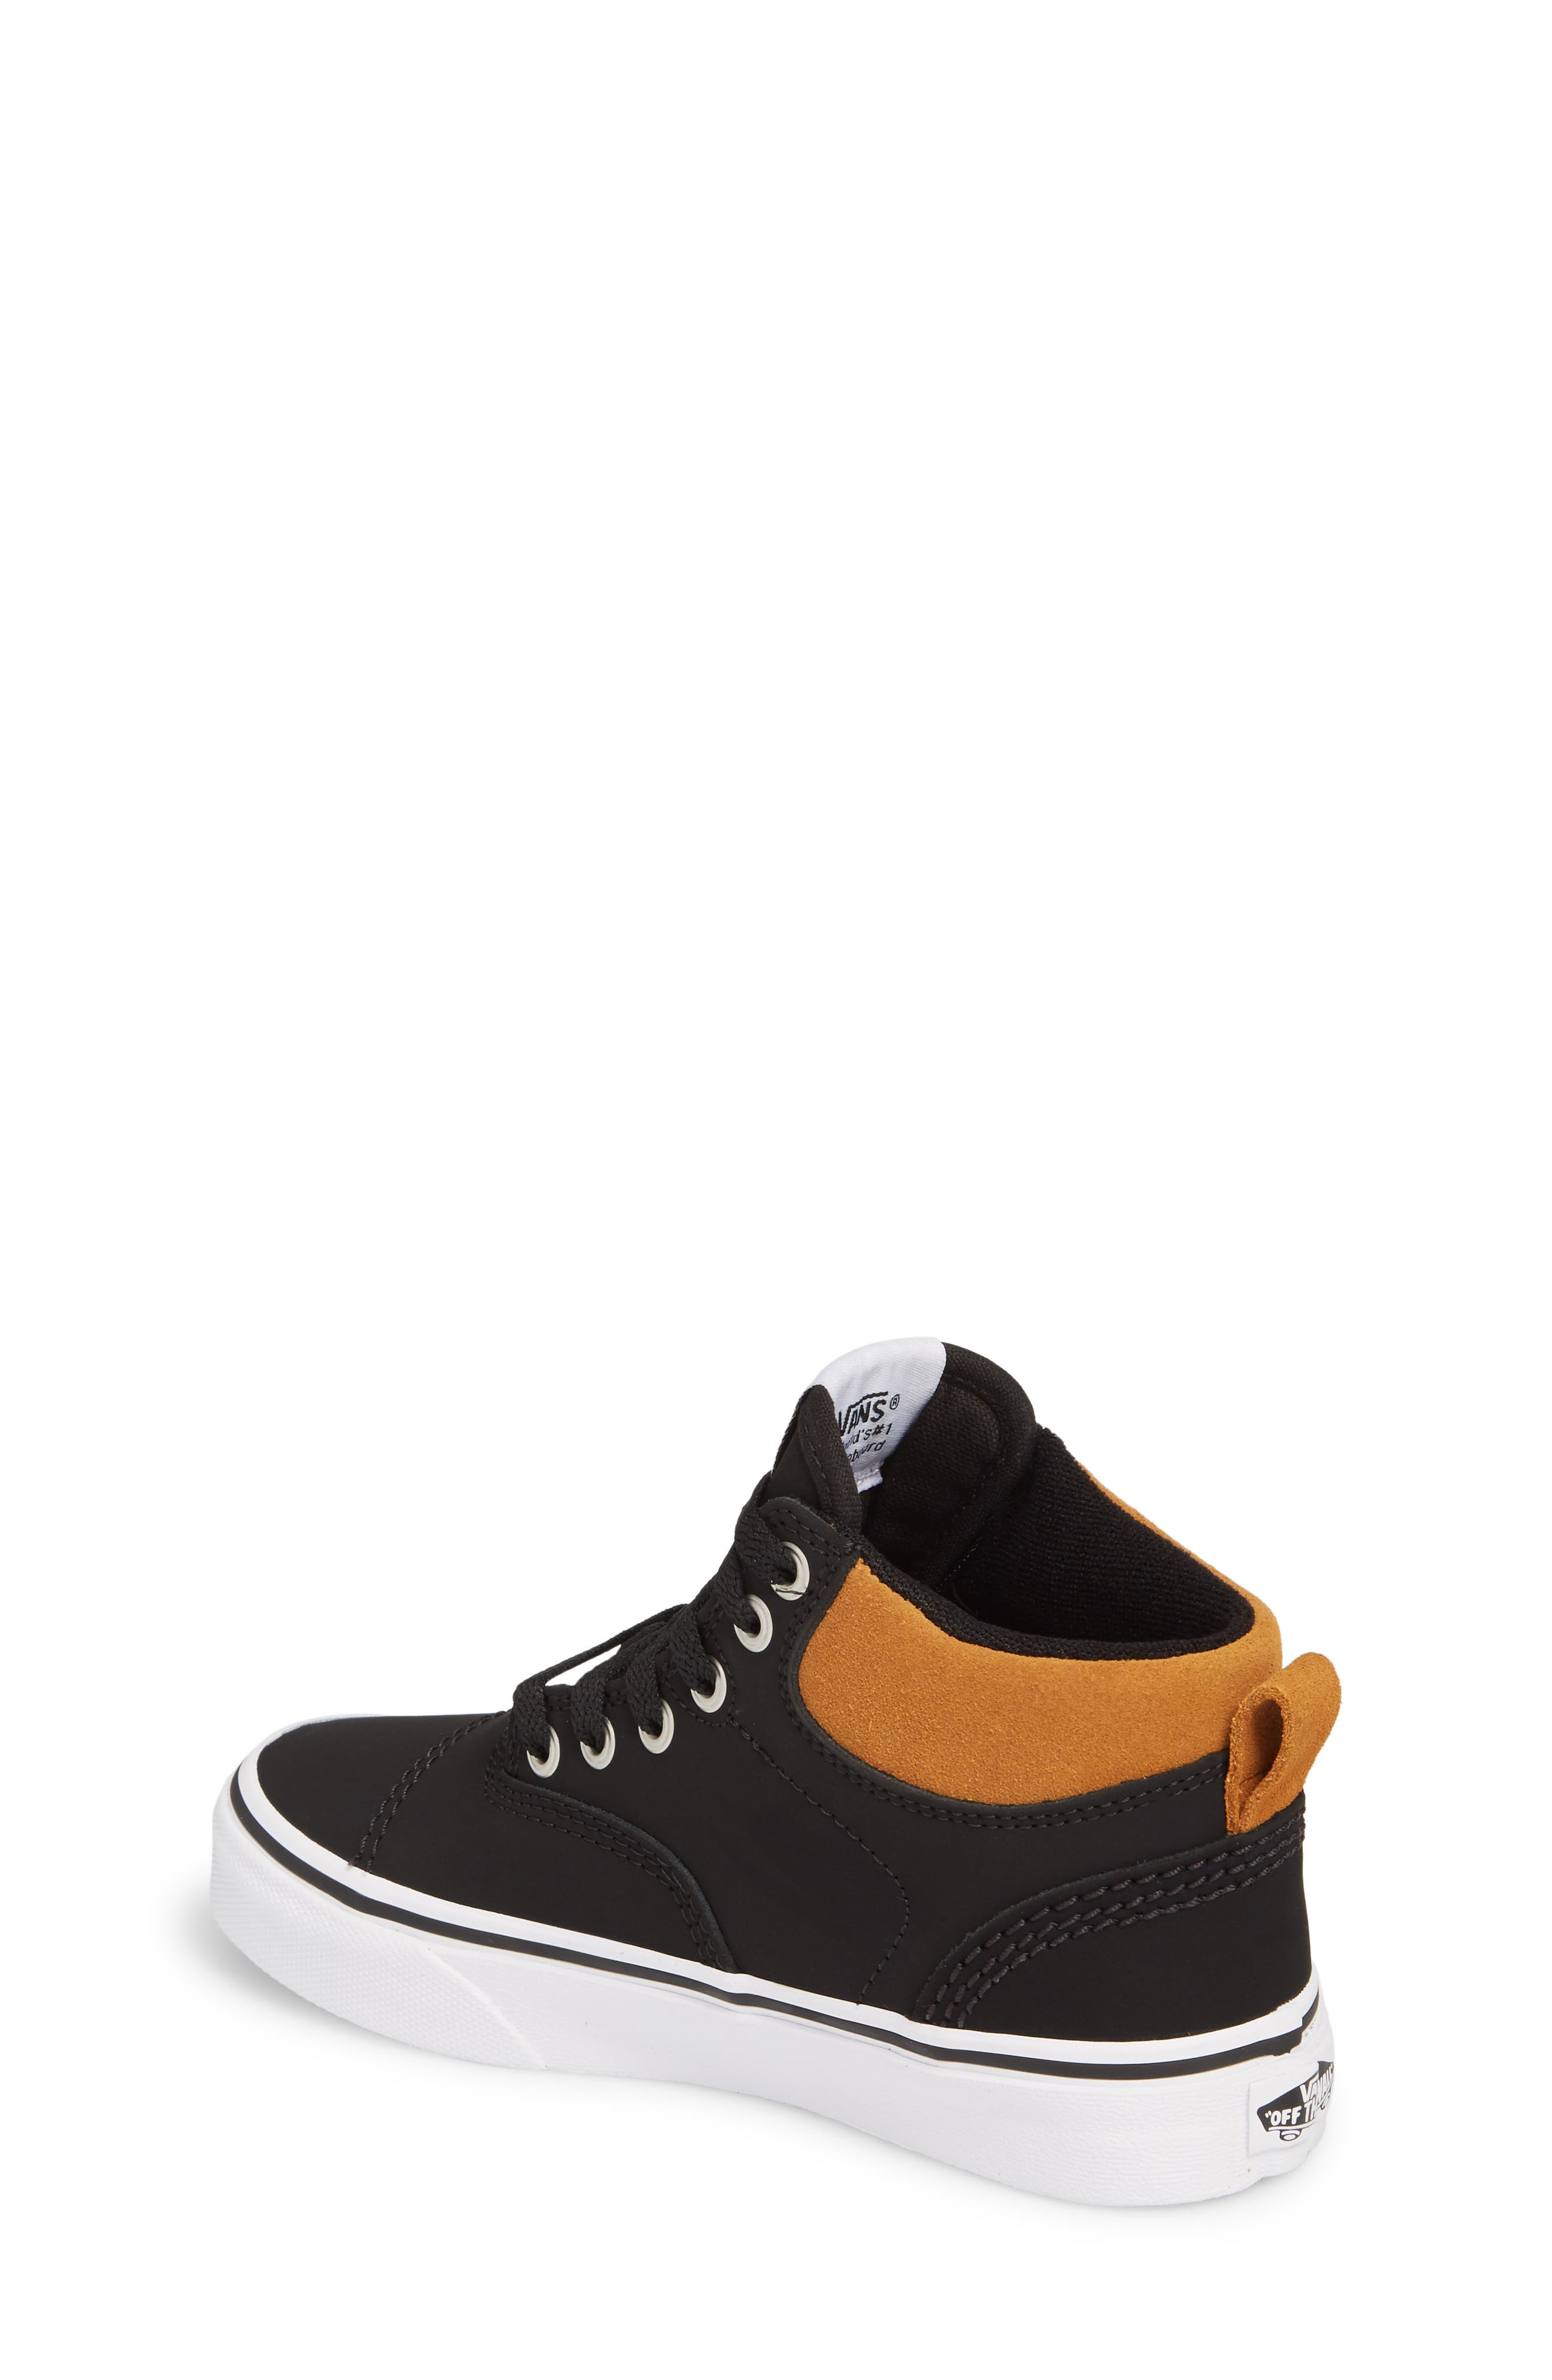 Era - Hi Sneaker,                             Alternate thumbnail 2, color,                             Vansbuck Black/ Cathay Spice